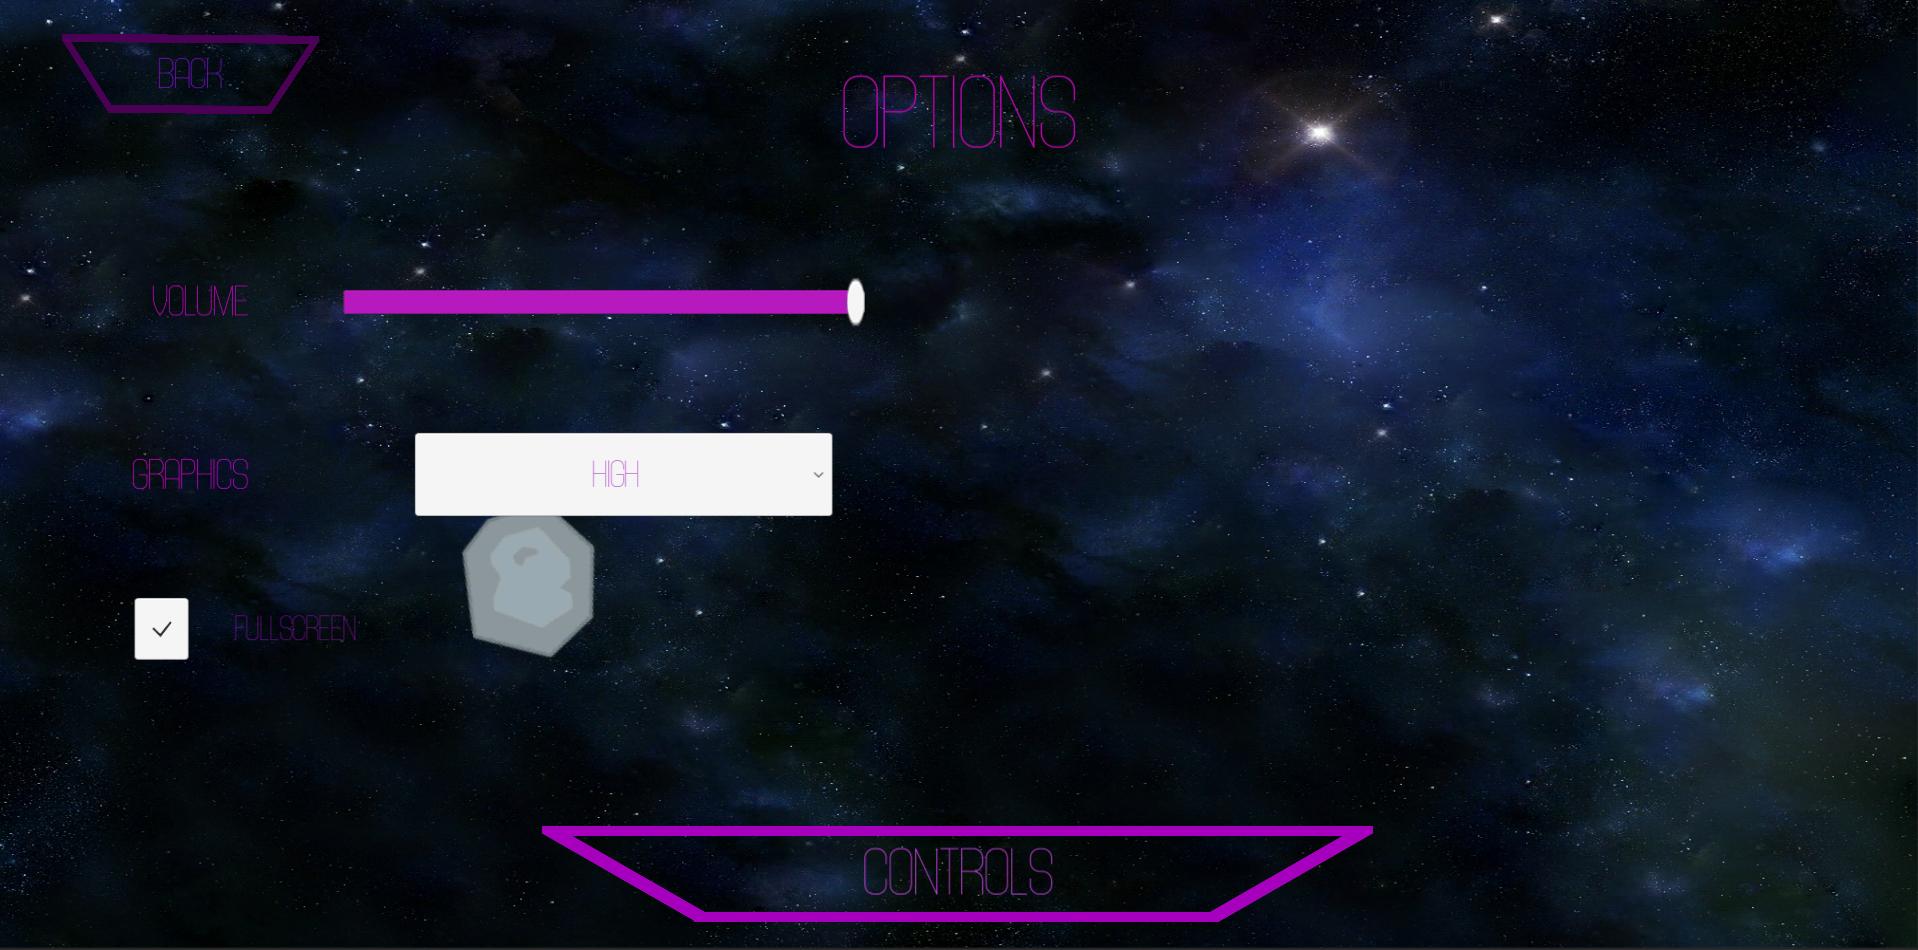 optionsScreen.PNG